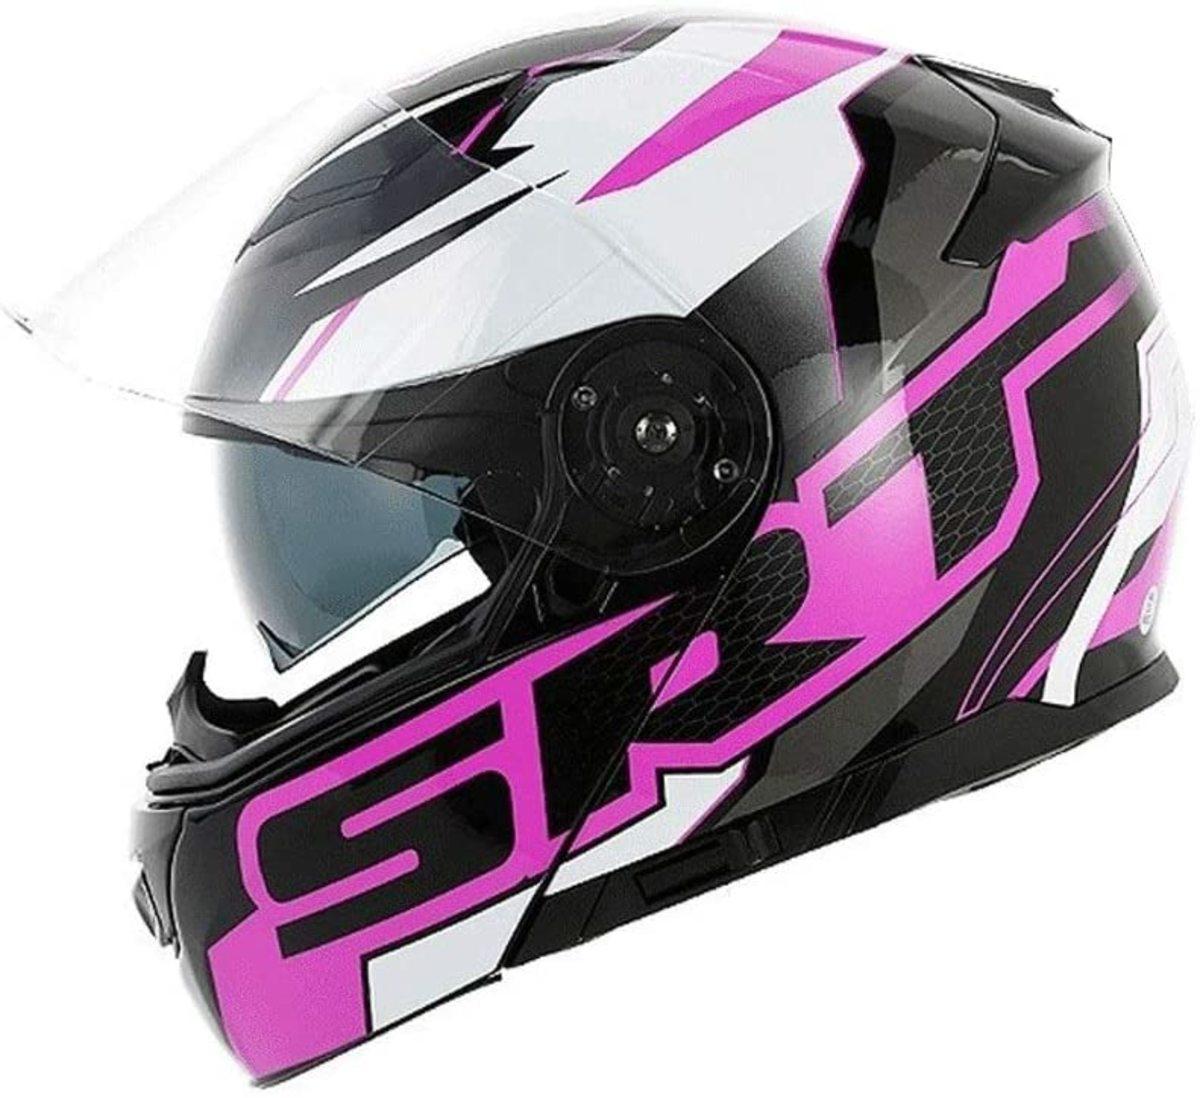 Double Lens Open Face Motorcycle Helmet Men Women Anti-Fog Full Helmet Cover Locomotive Four Seasons Security Protection (Color : Black Purple Dodge)